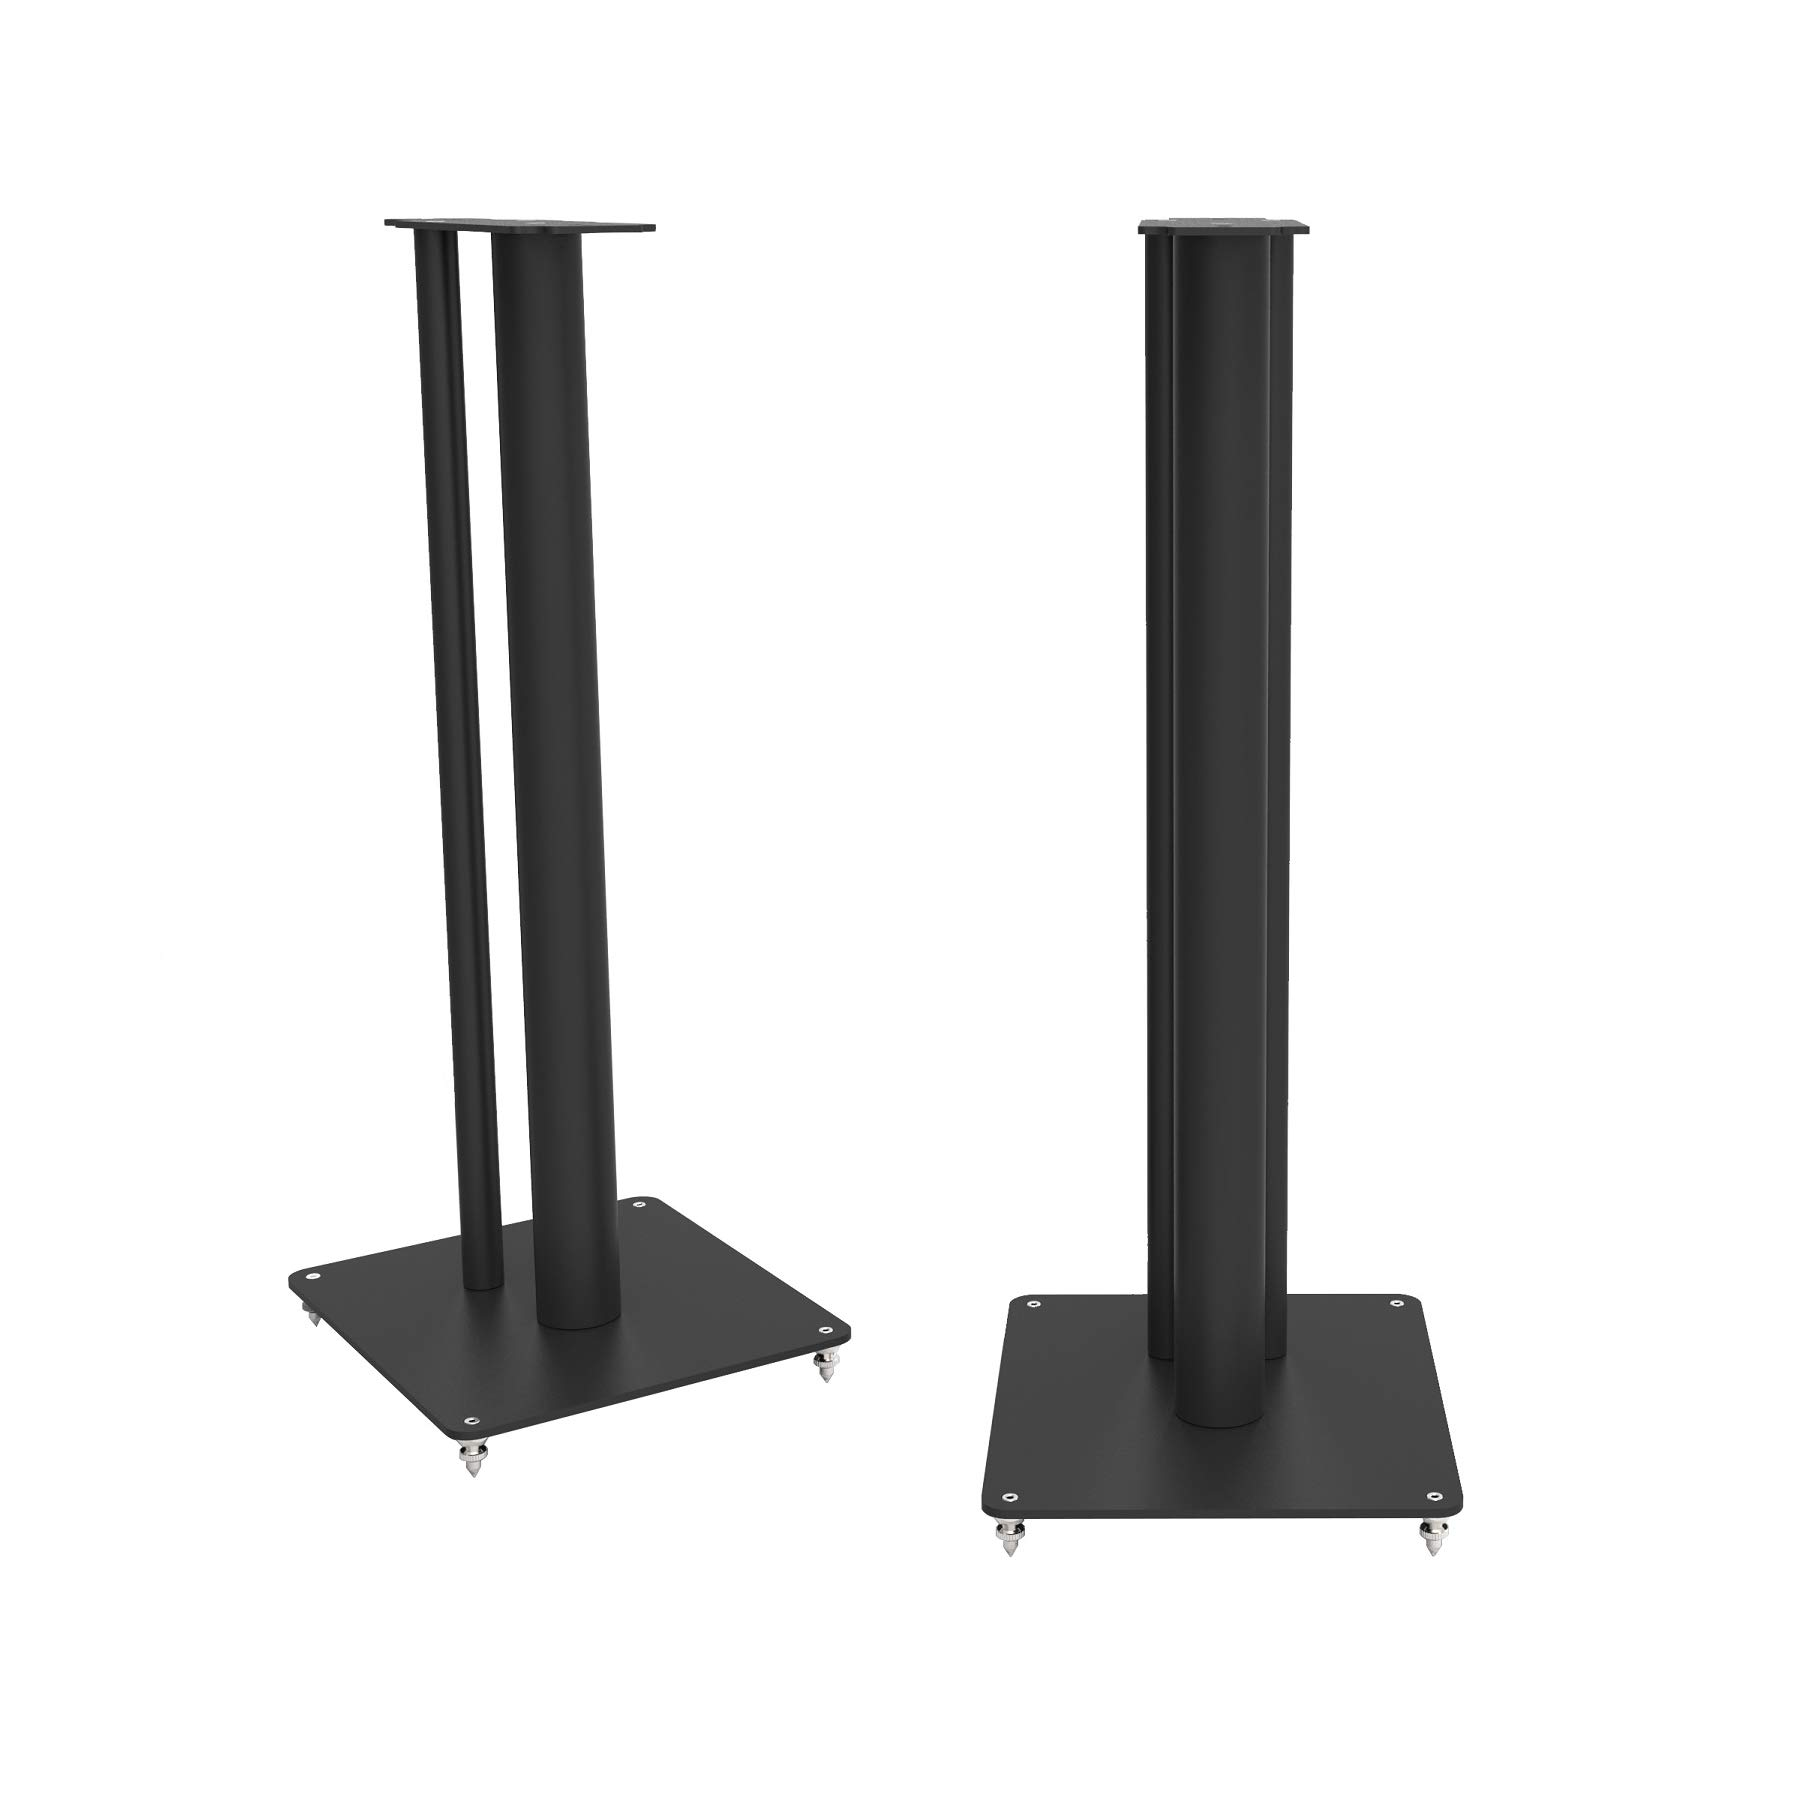 Q Acoustics 3000i Speaker Stand Pair (Black) by Q Acoustics